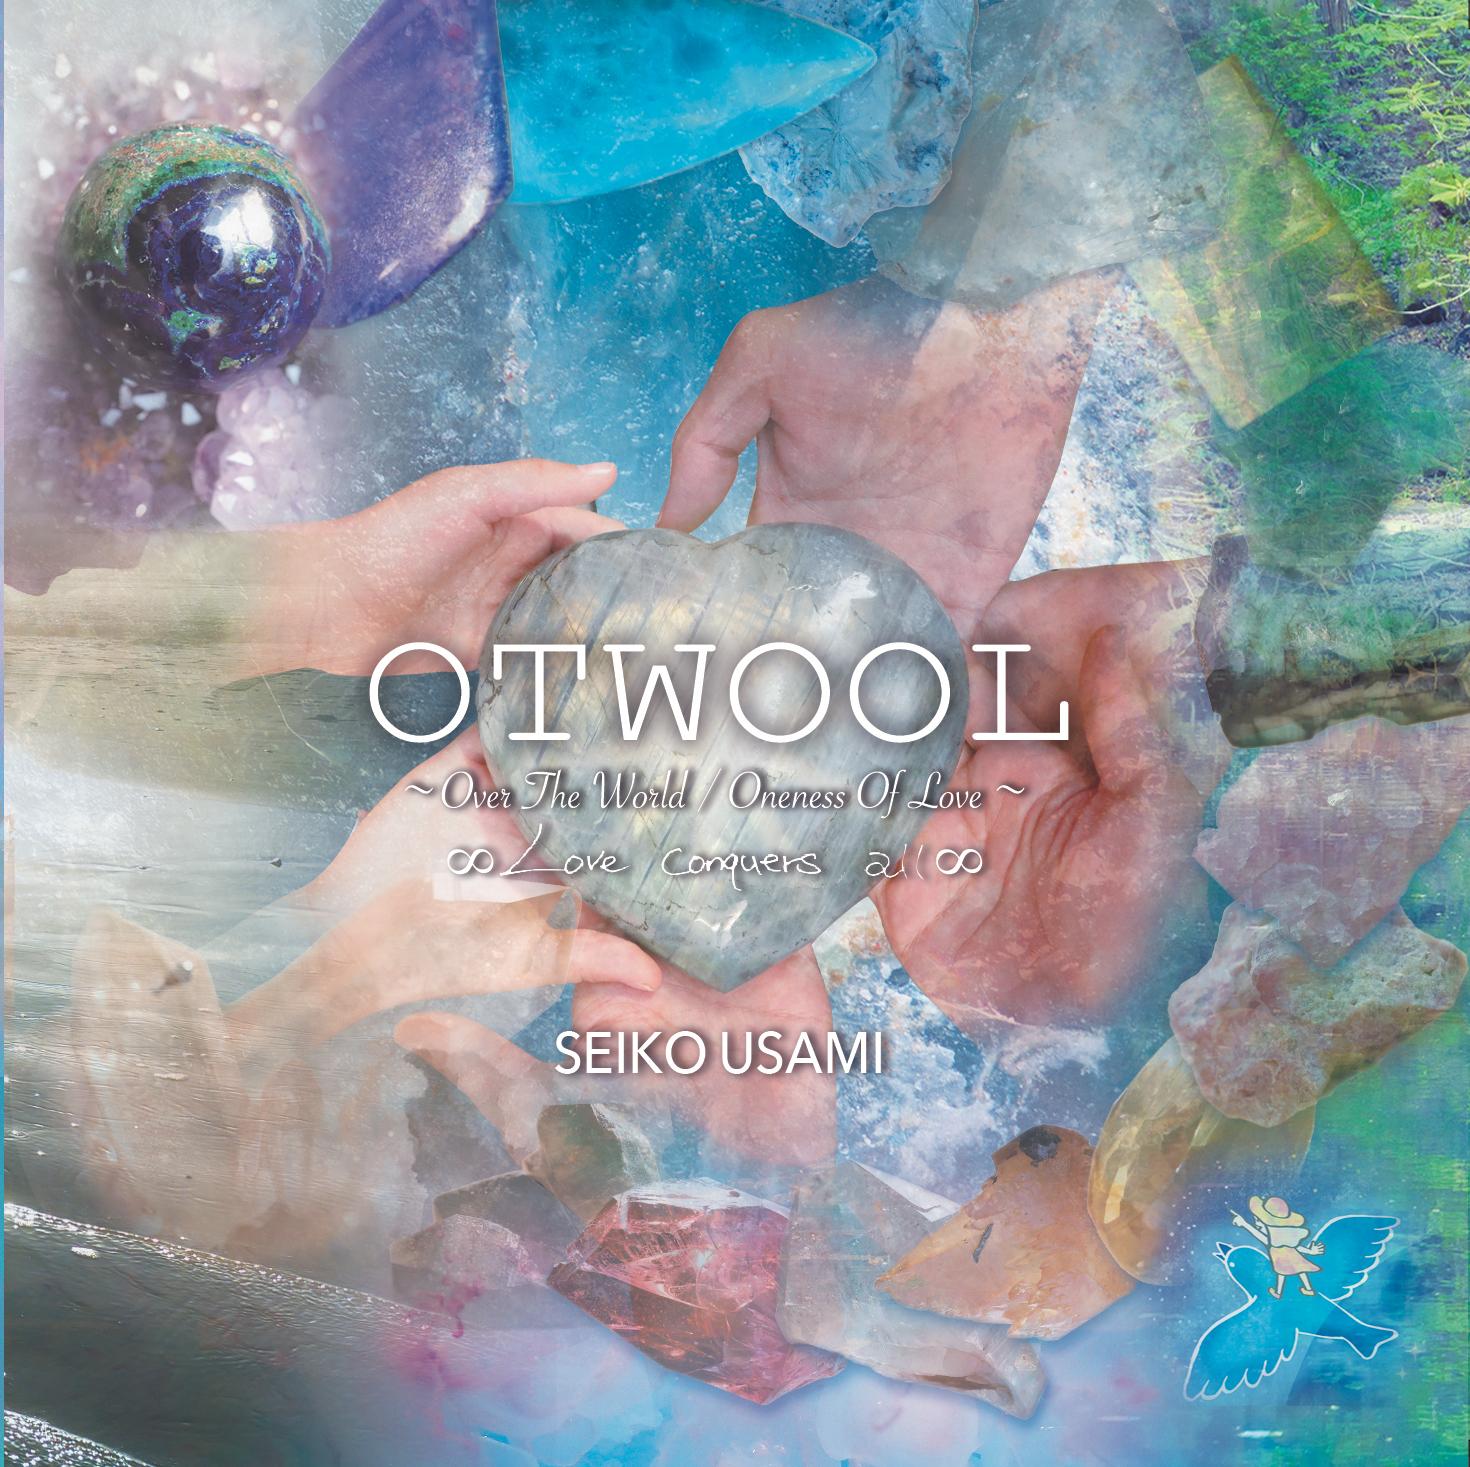 OTWOOL - Seiko Usami 1st フルアルバム